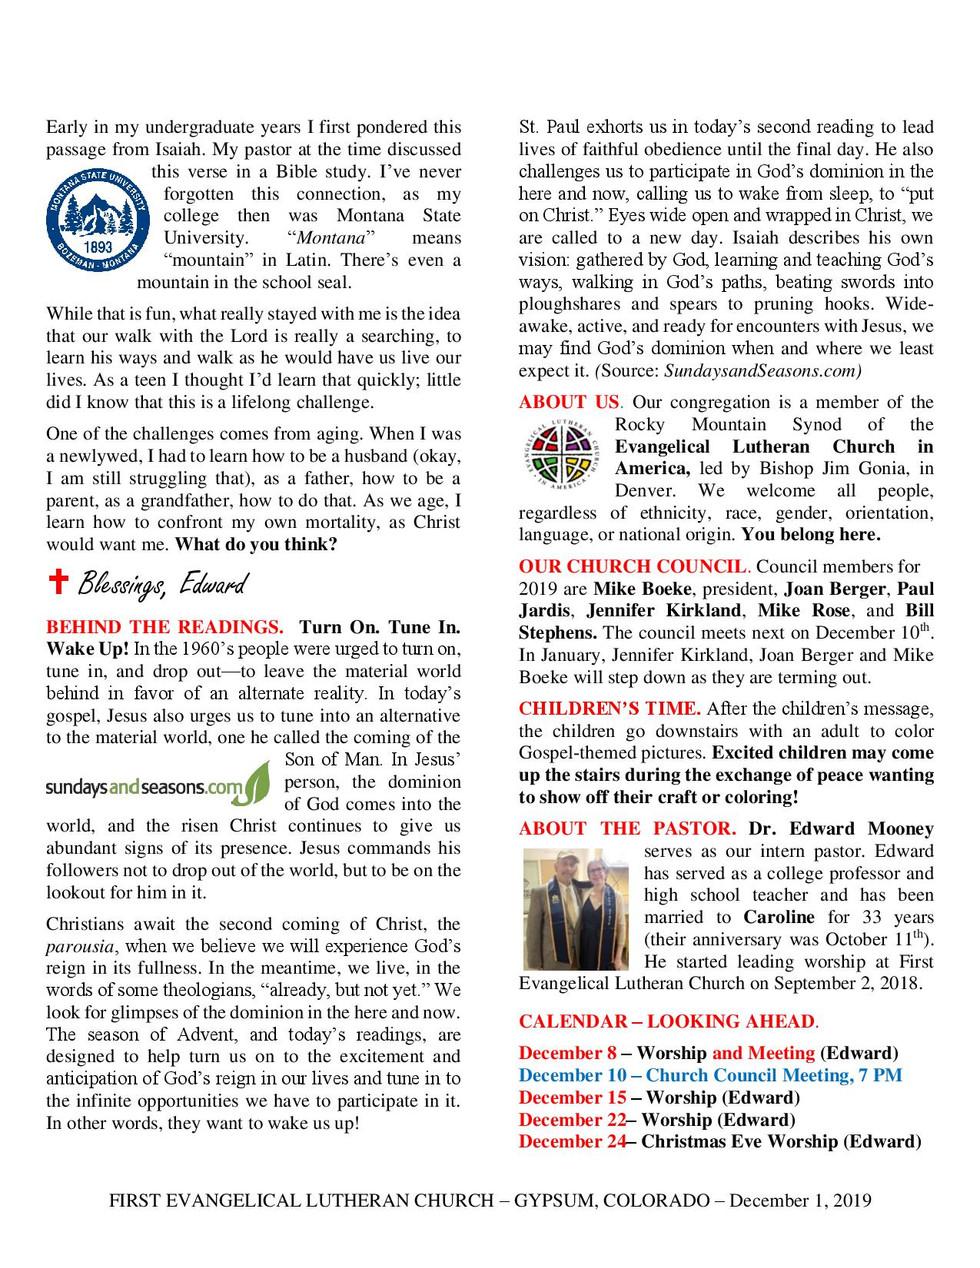 Newsletter, December 1, 2019, page 2.